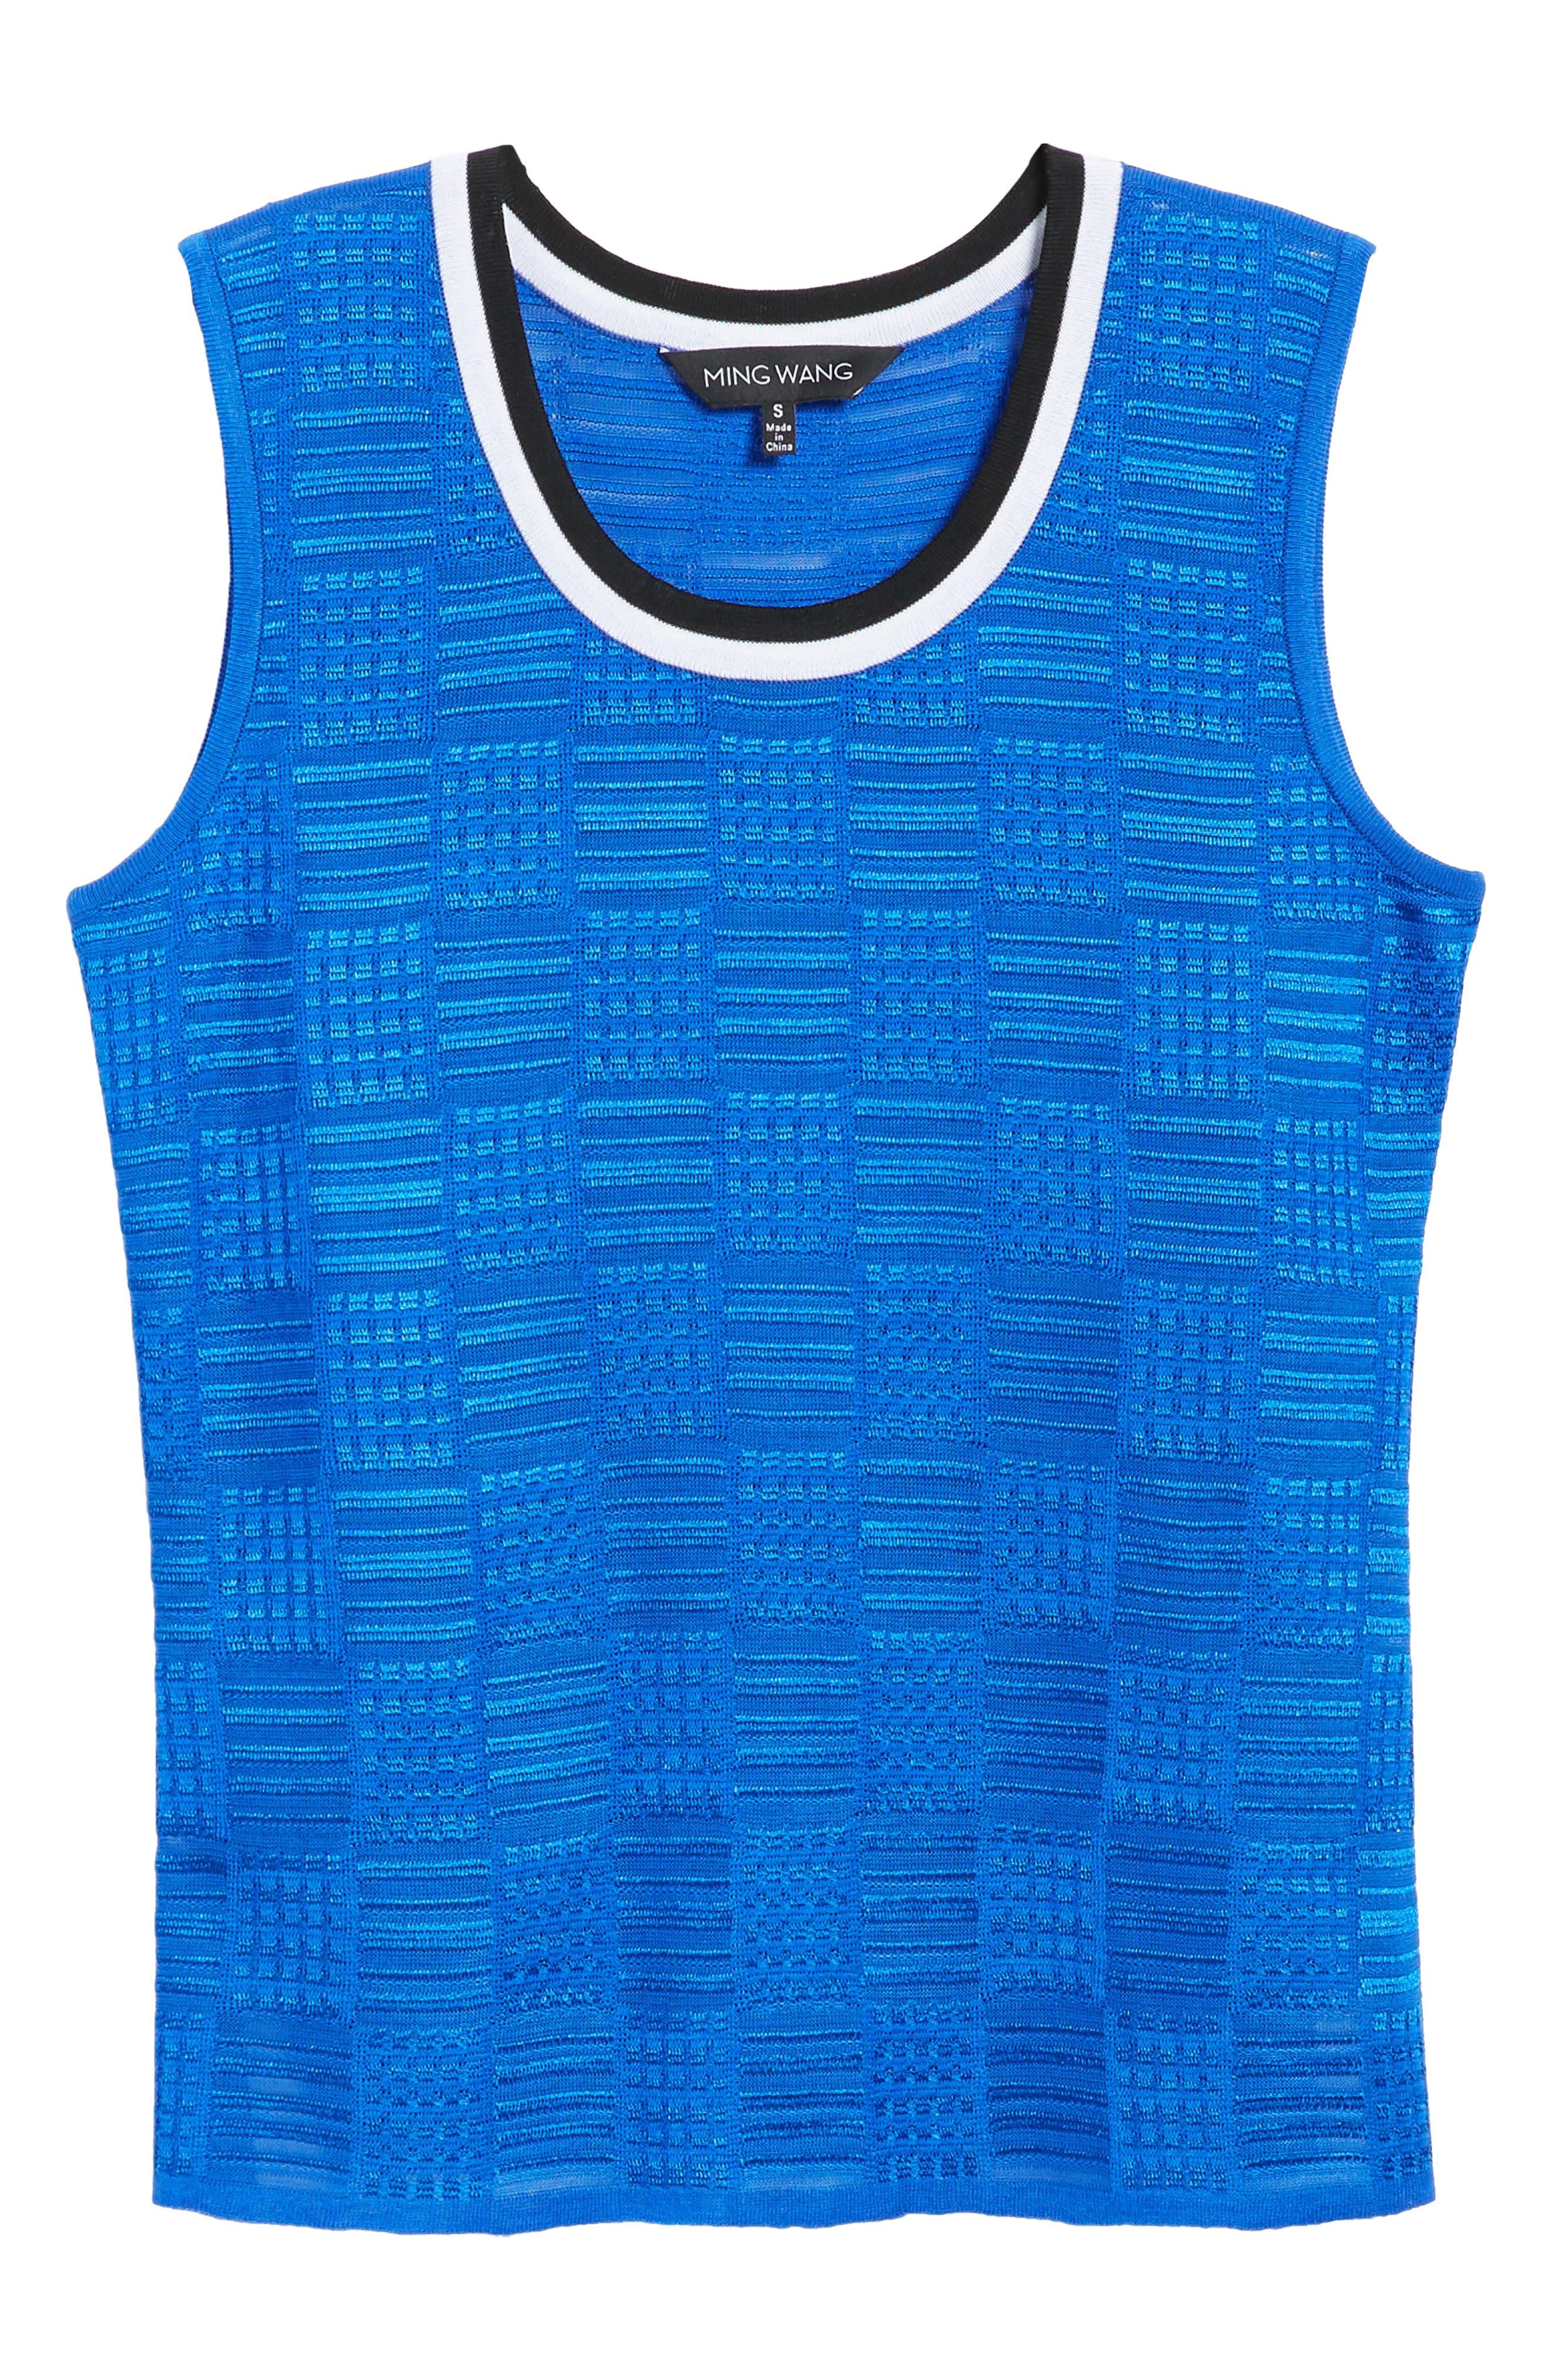 Contrast Neck Basket Weave Tank,                             Alternate thumbnail 6, color,                             Patriot Blue/ Black/ White